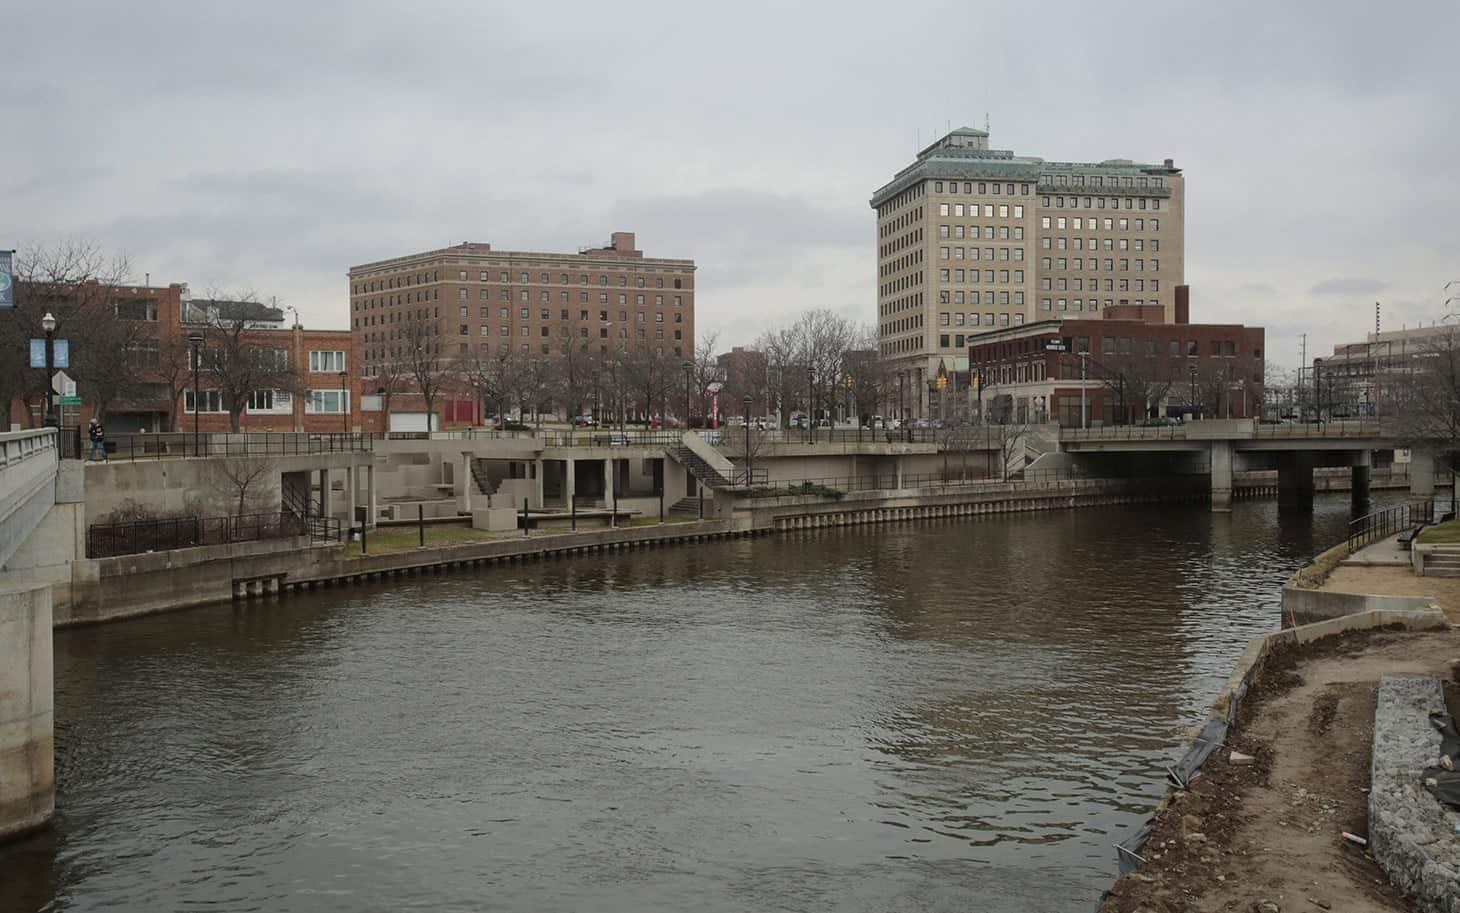 The Flint River flows through downtown Flint, Michigan. Photo by Rebecca Cook/Reuters